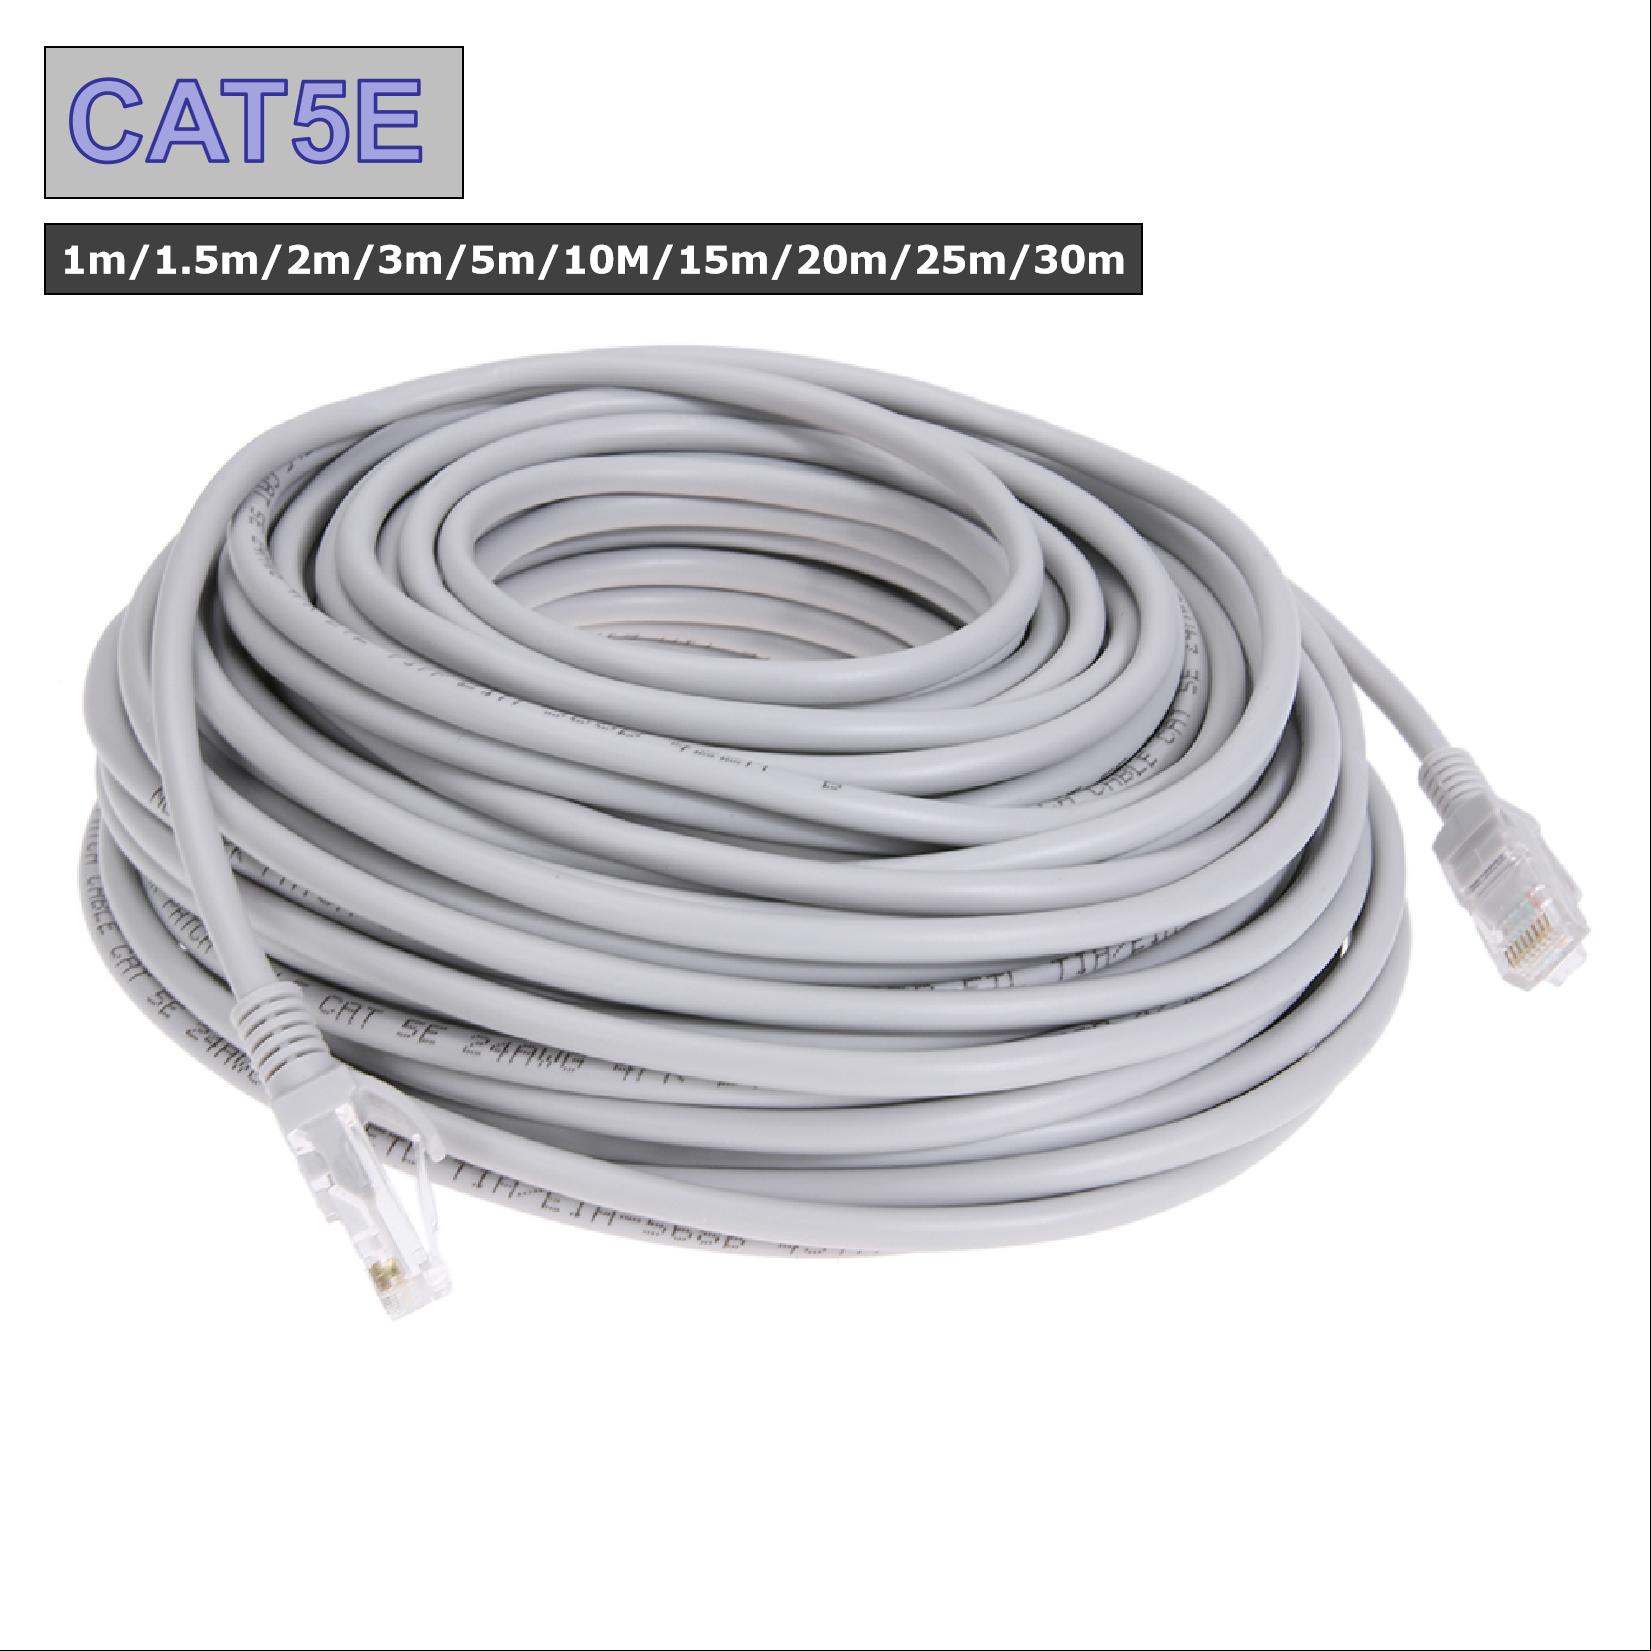 Computer Cables RJ45 Ethernet Cable 1M 1.5M 2M 3M 5M 10M 15M 20M 25M 30M for Cat5e Internet Network Patch LAN Cable Cord for PC Computer Cable Length: 5m